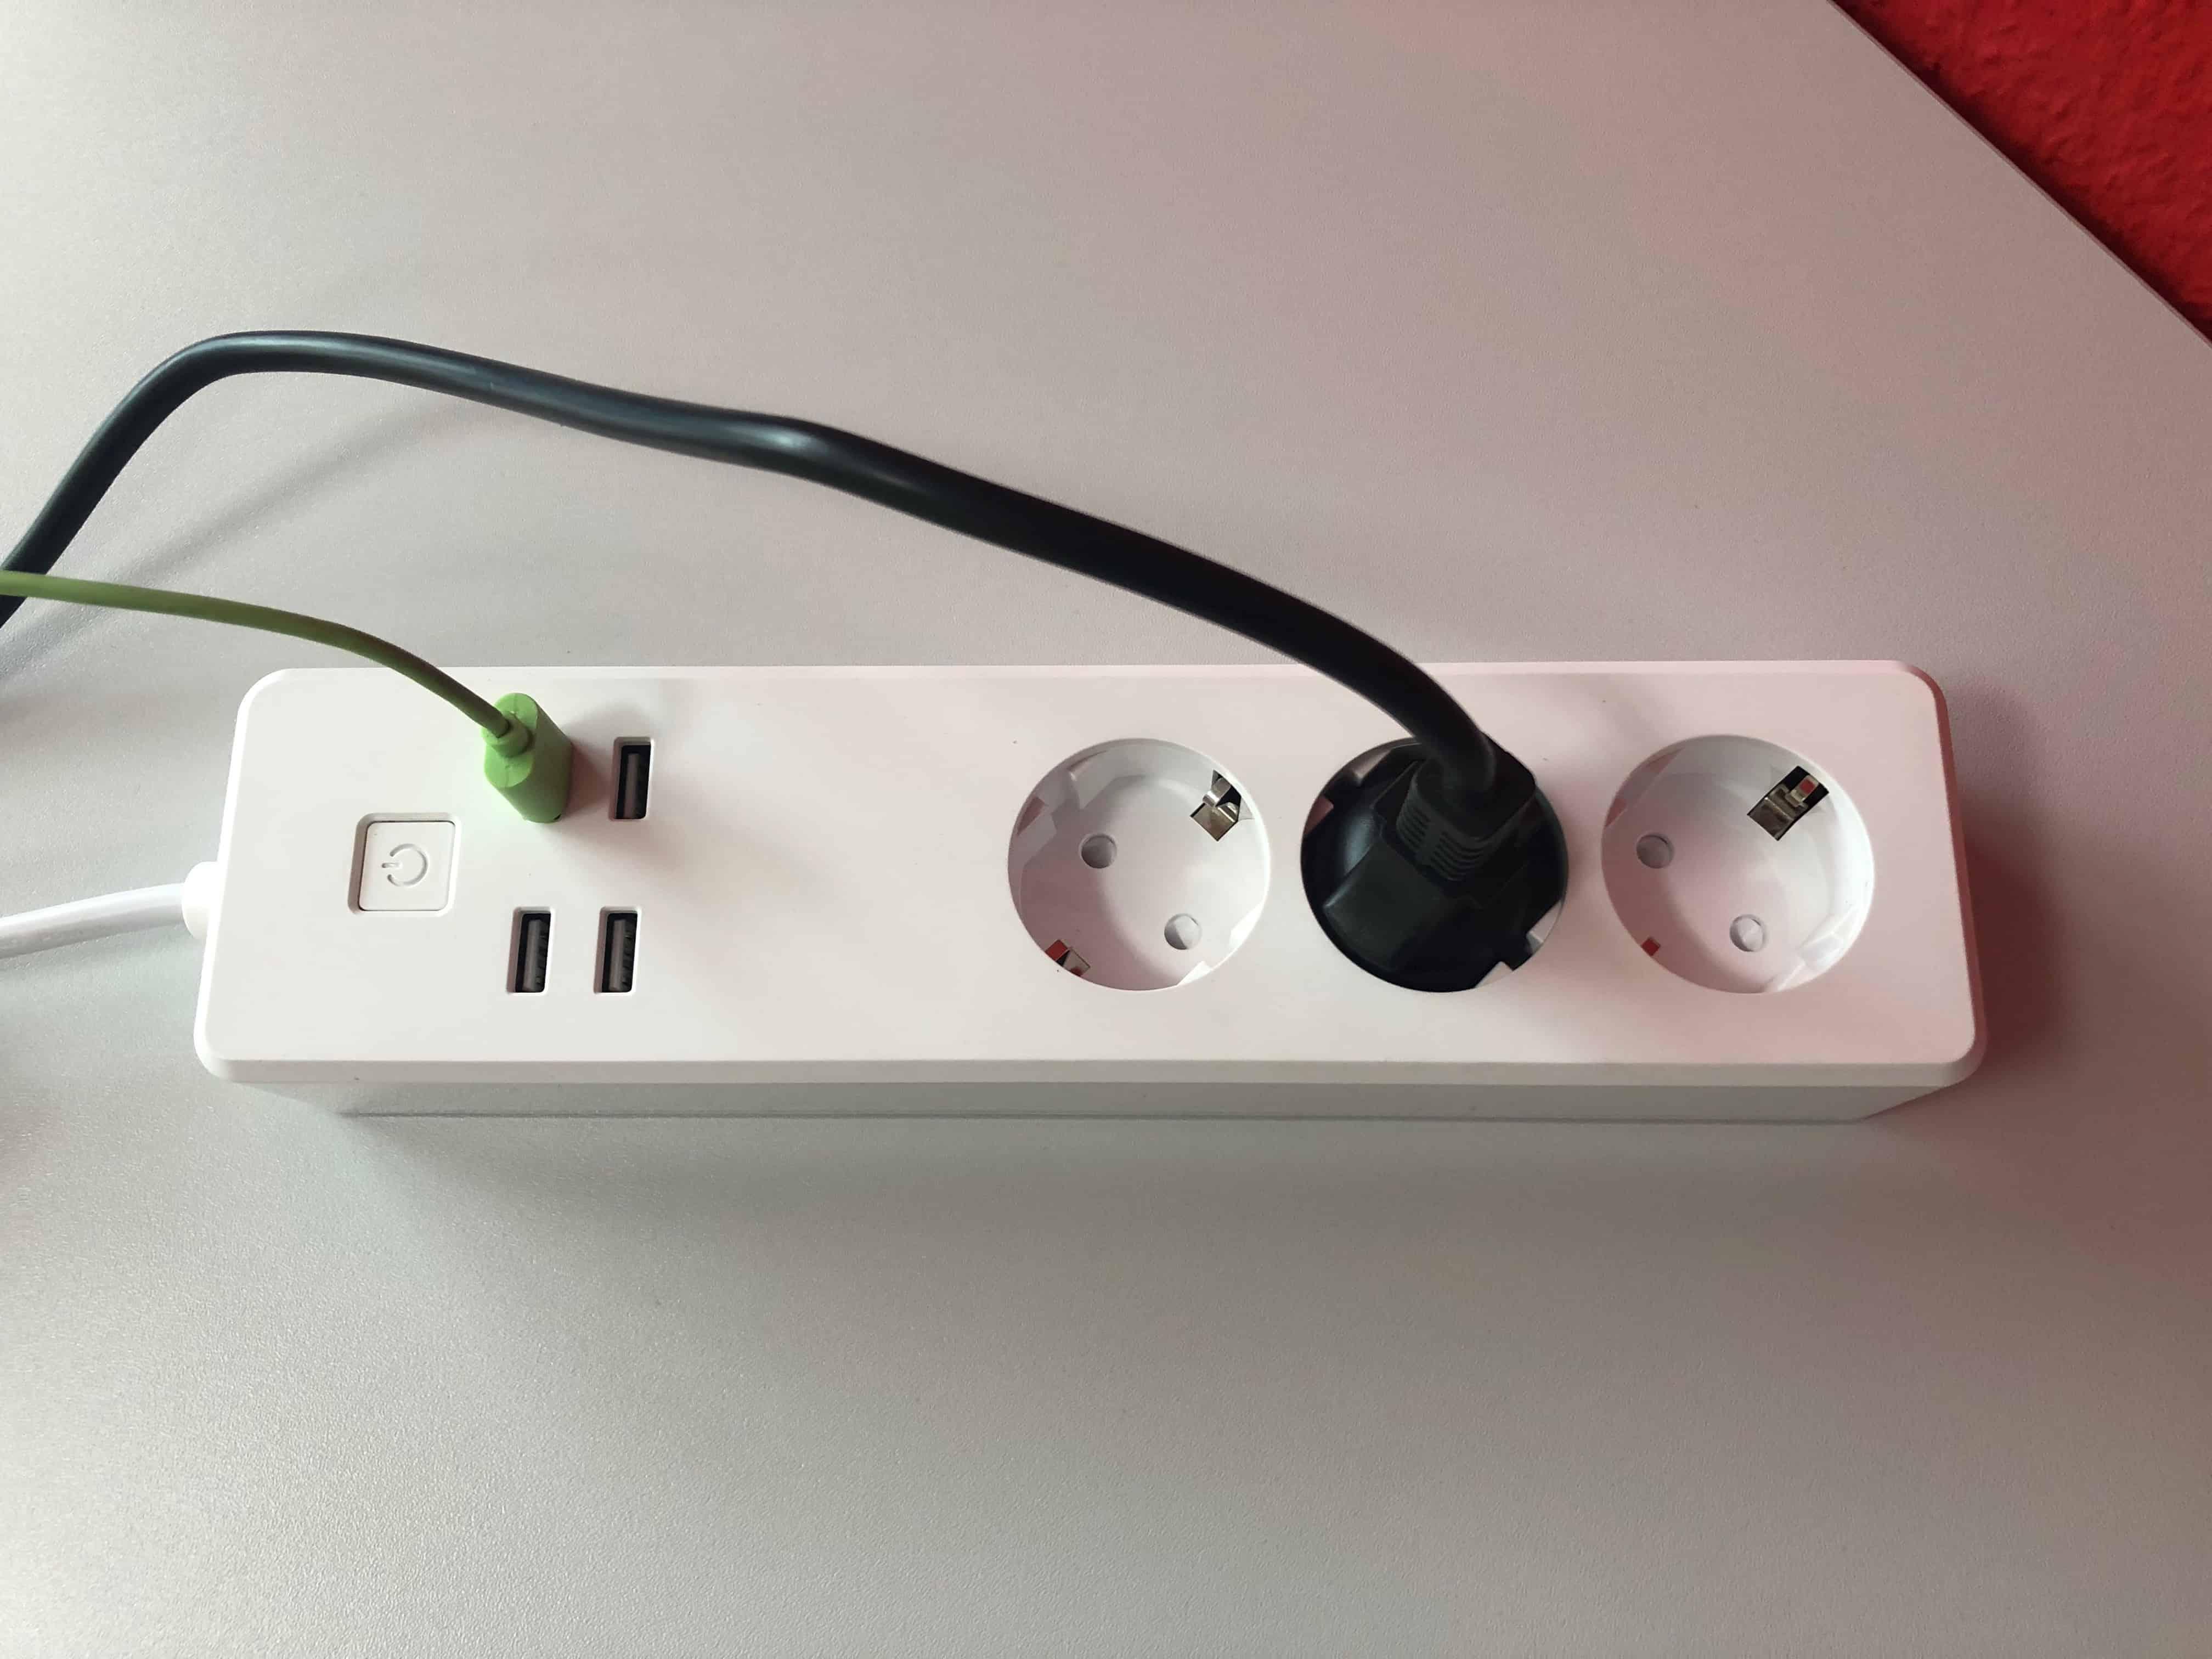 Meross MSS425E - Smarte Steckdosenleiste im Test - smarthomeblog.de